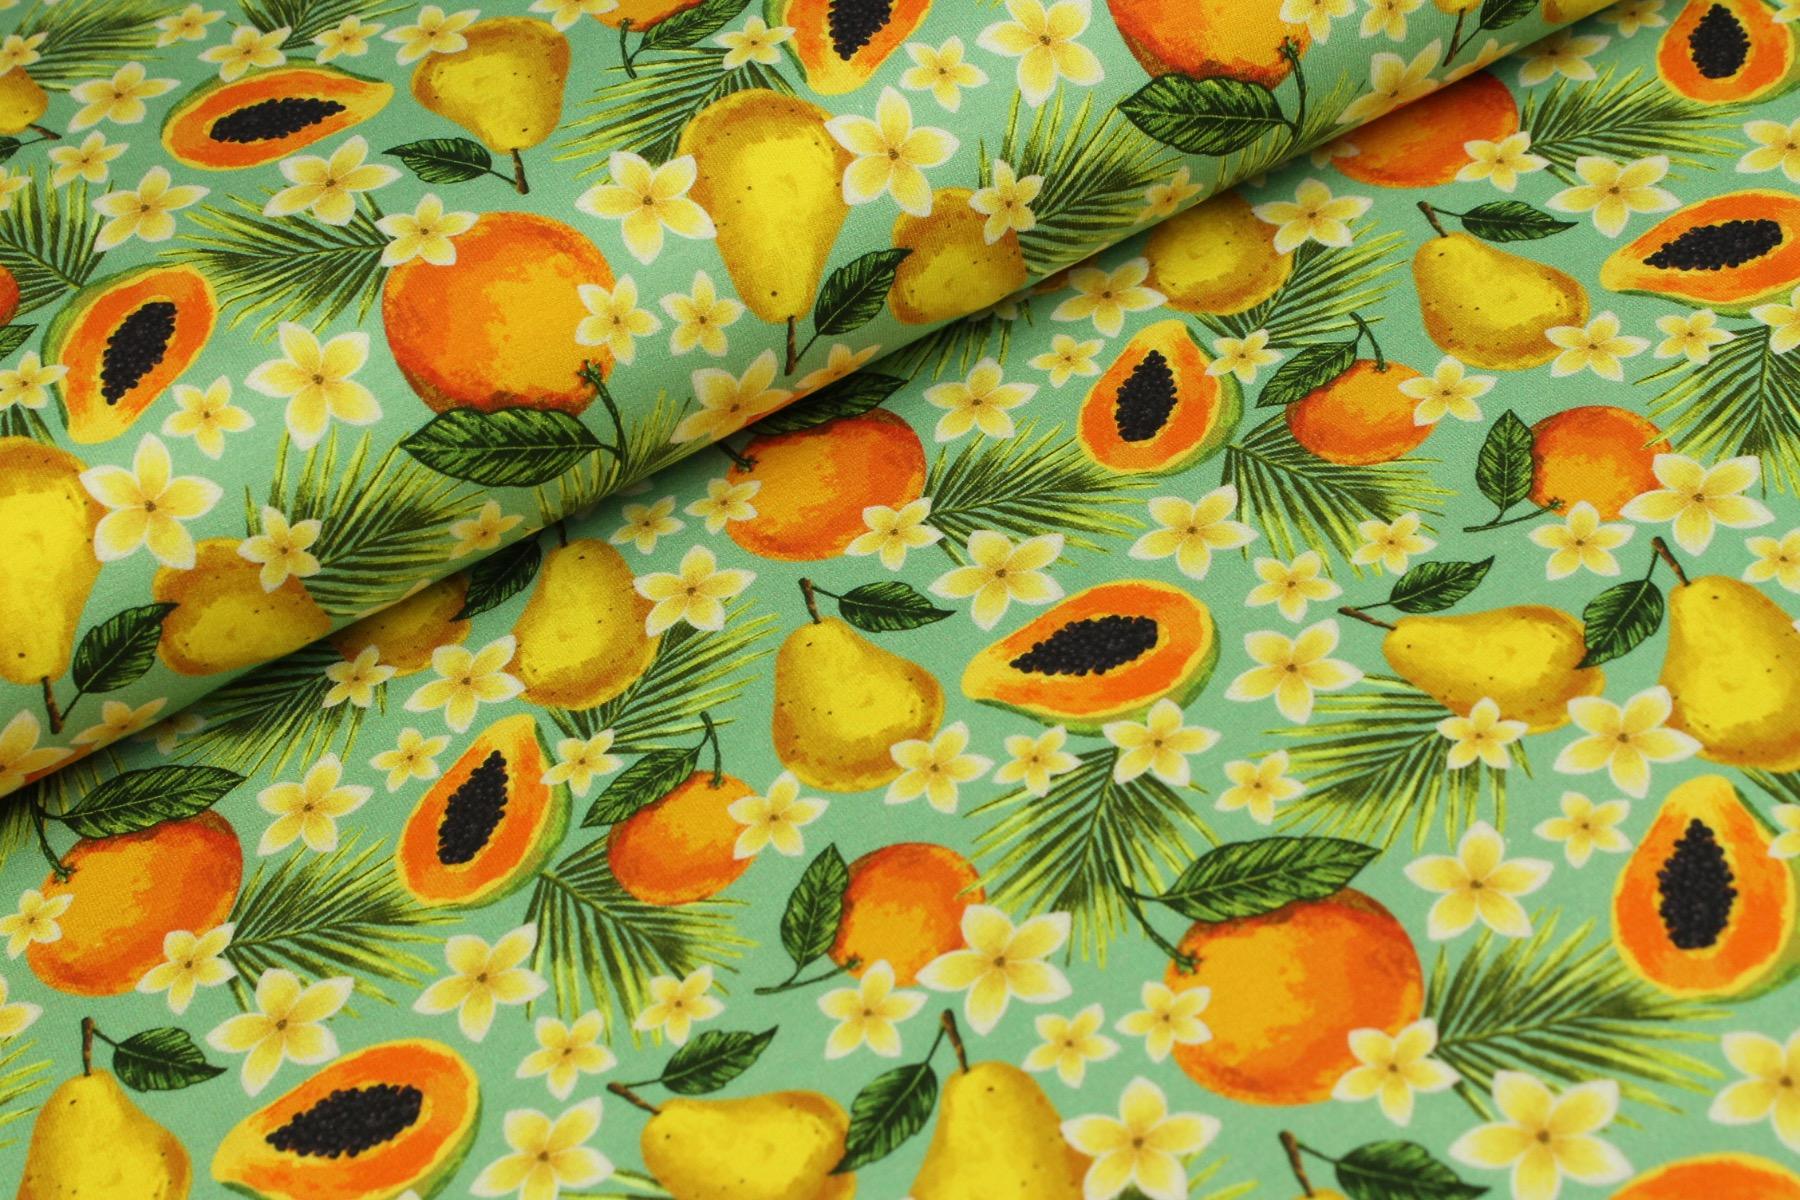 Fruit And Blossom Tricot Zeegroen - Megan Blue